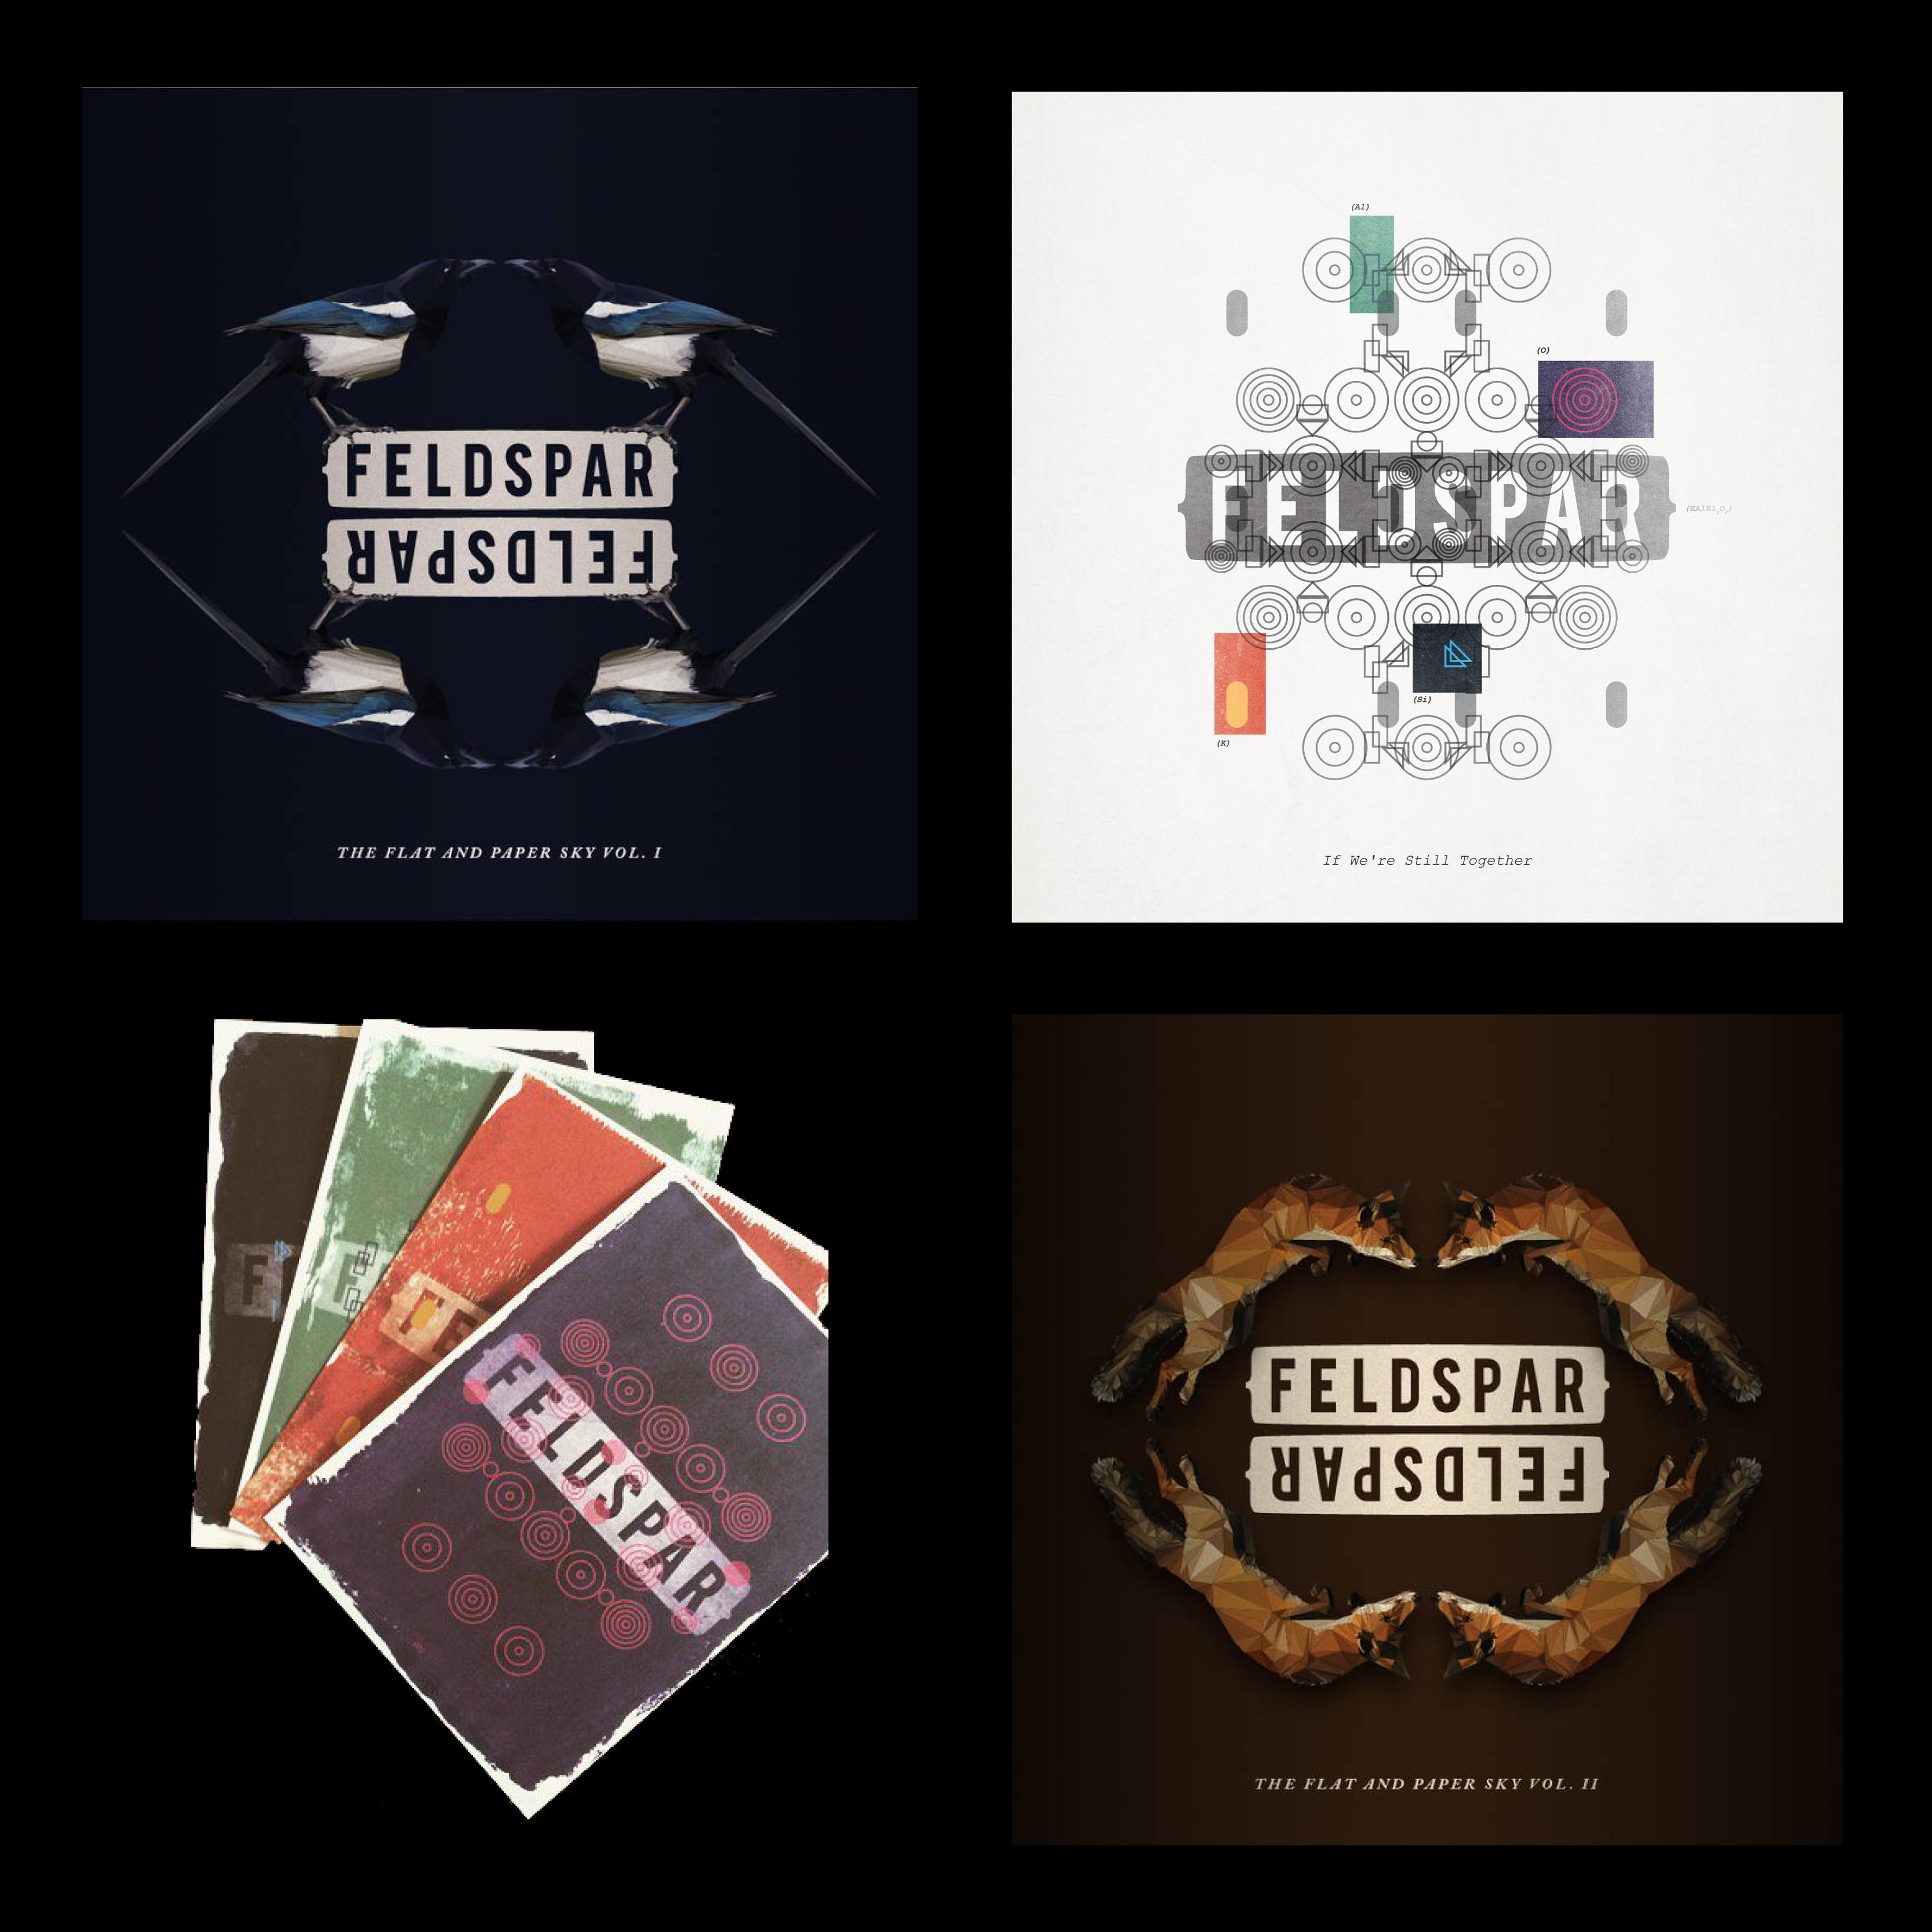 Feldspar **All Music** Bundle with Postcards